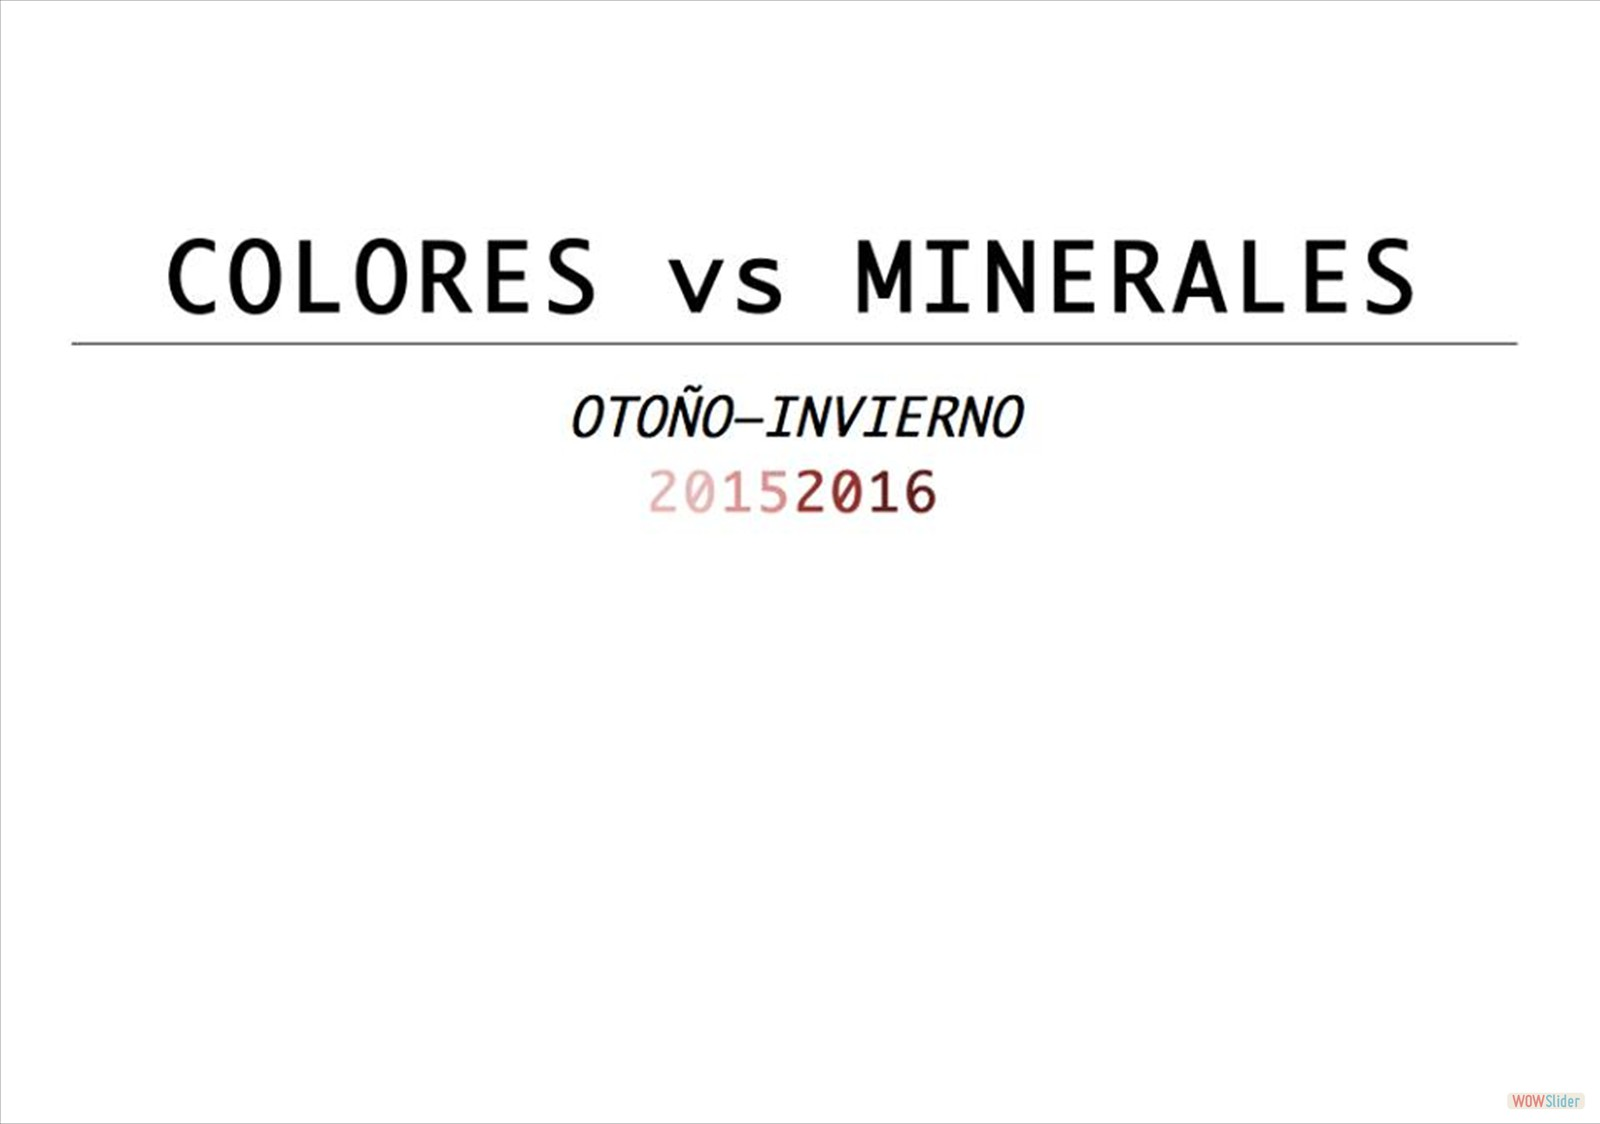 0.Minerales vs colores